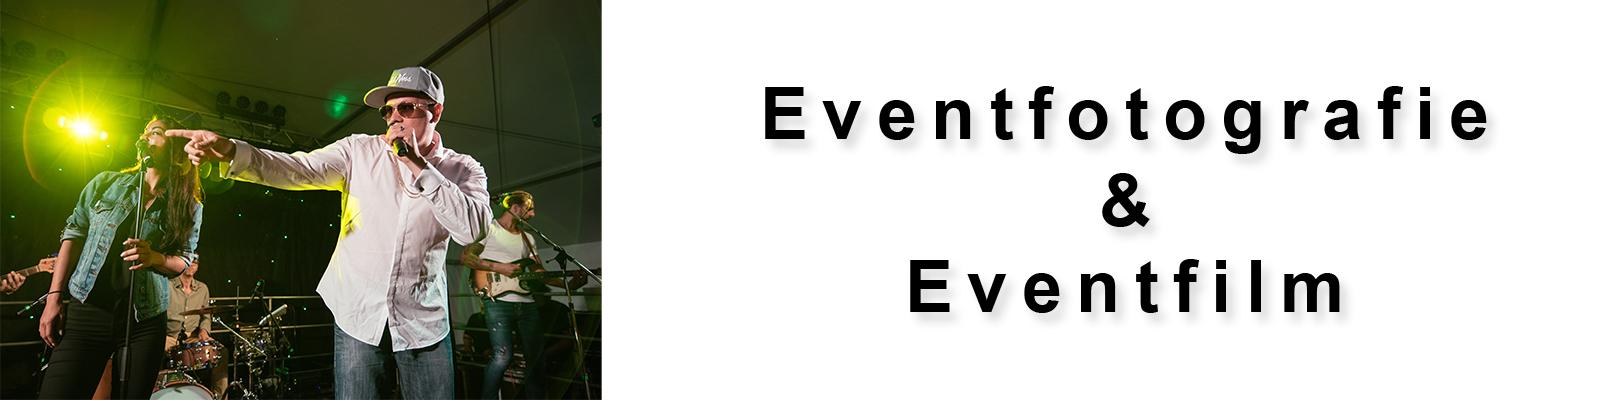 Eventfotografie_menu